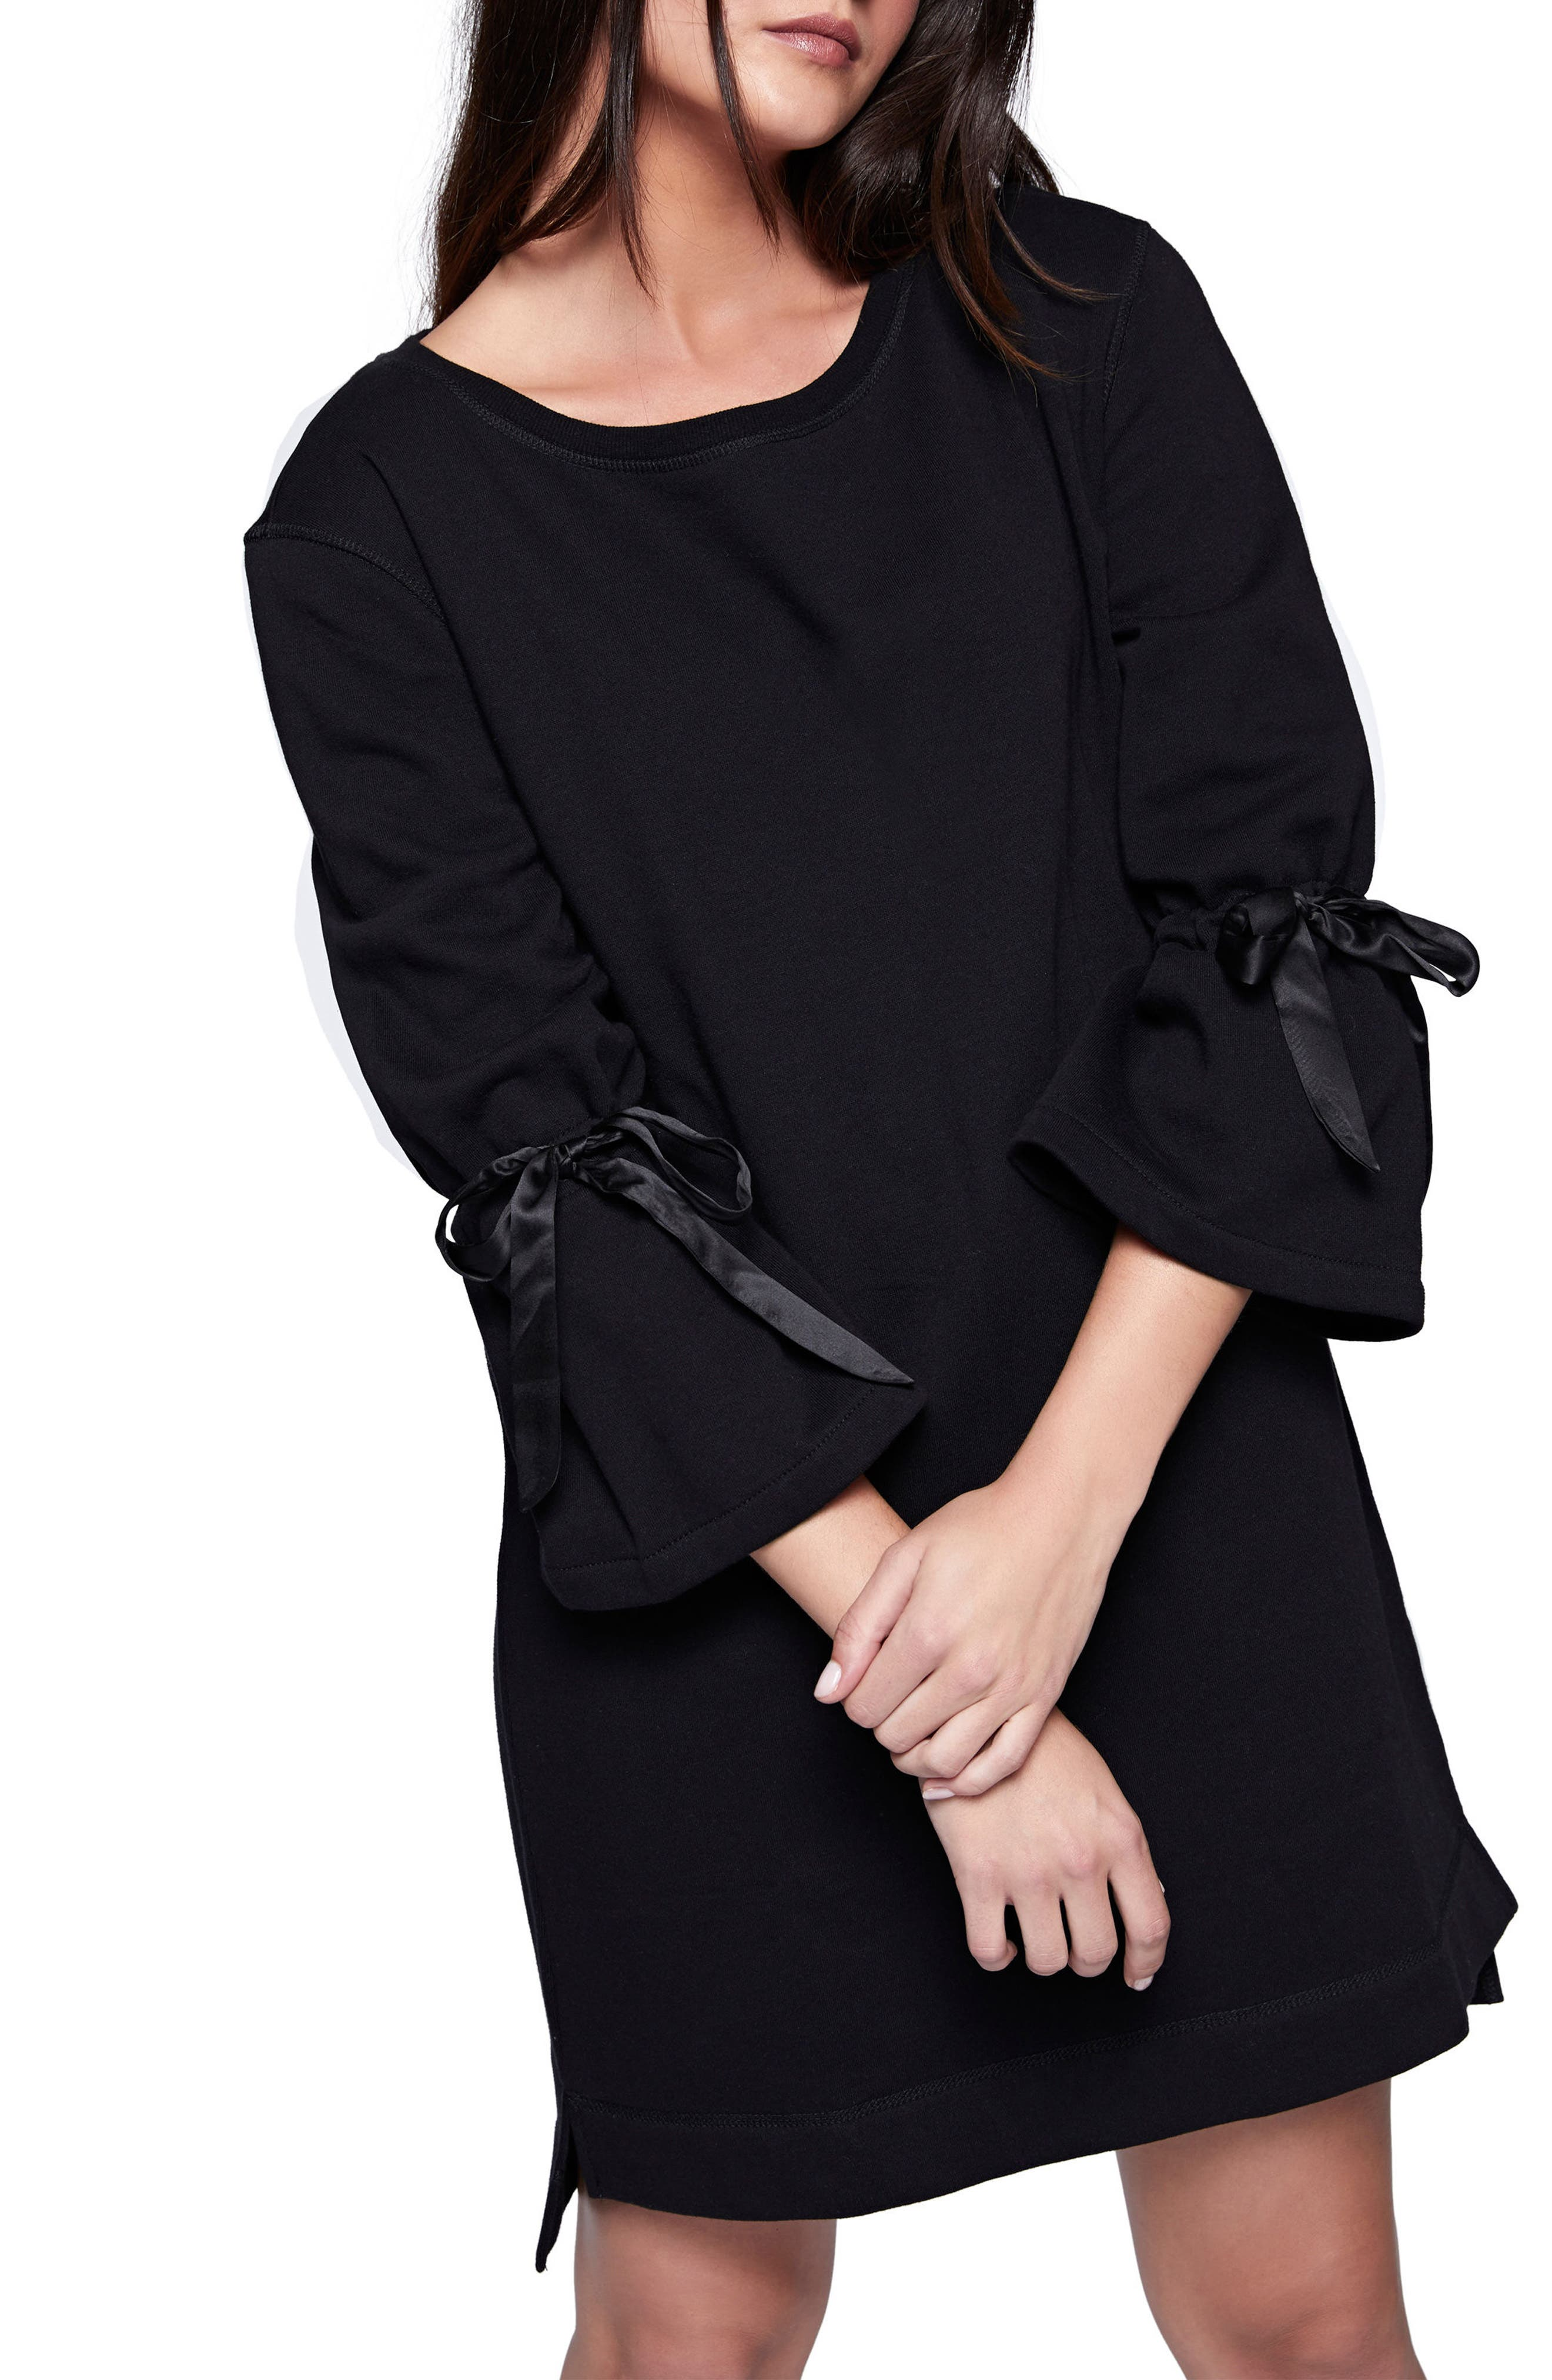 Bell Sleeve Sweatshirt Dress,                             Main thumbnail 1, color,                             Black